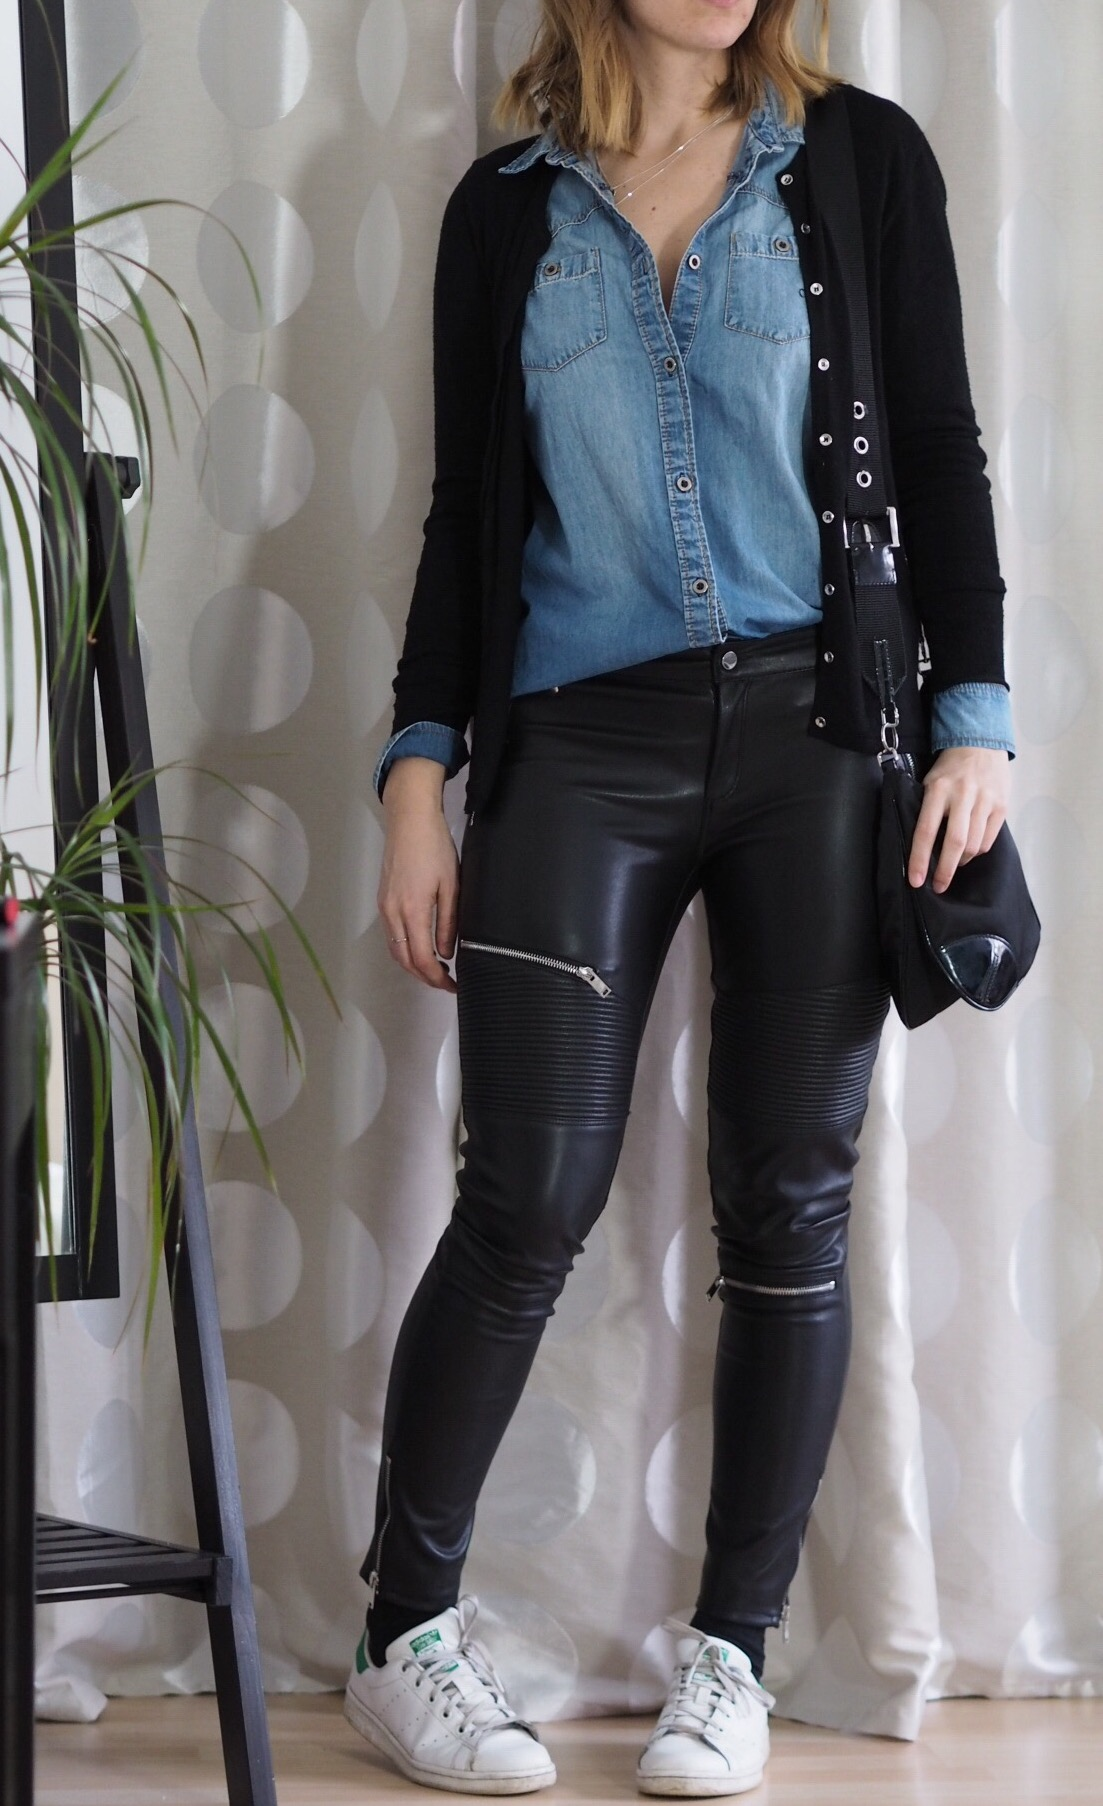 Outfit Modeblogger Zara Lederhose Jeanshemd